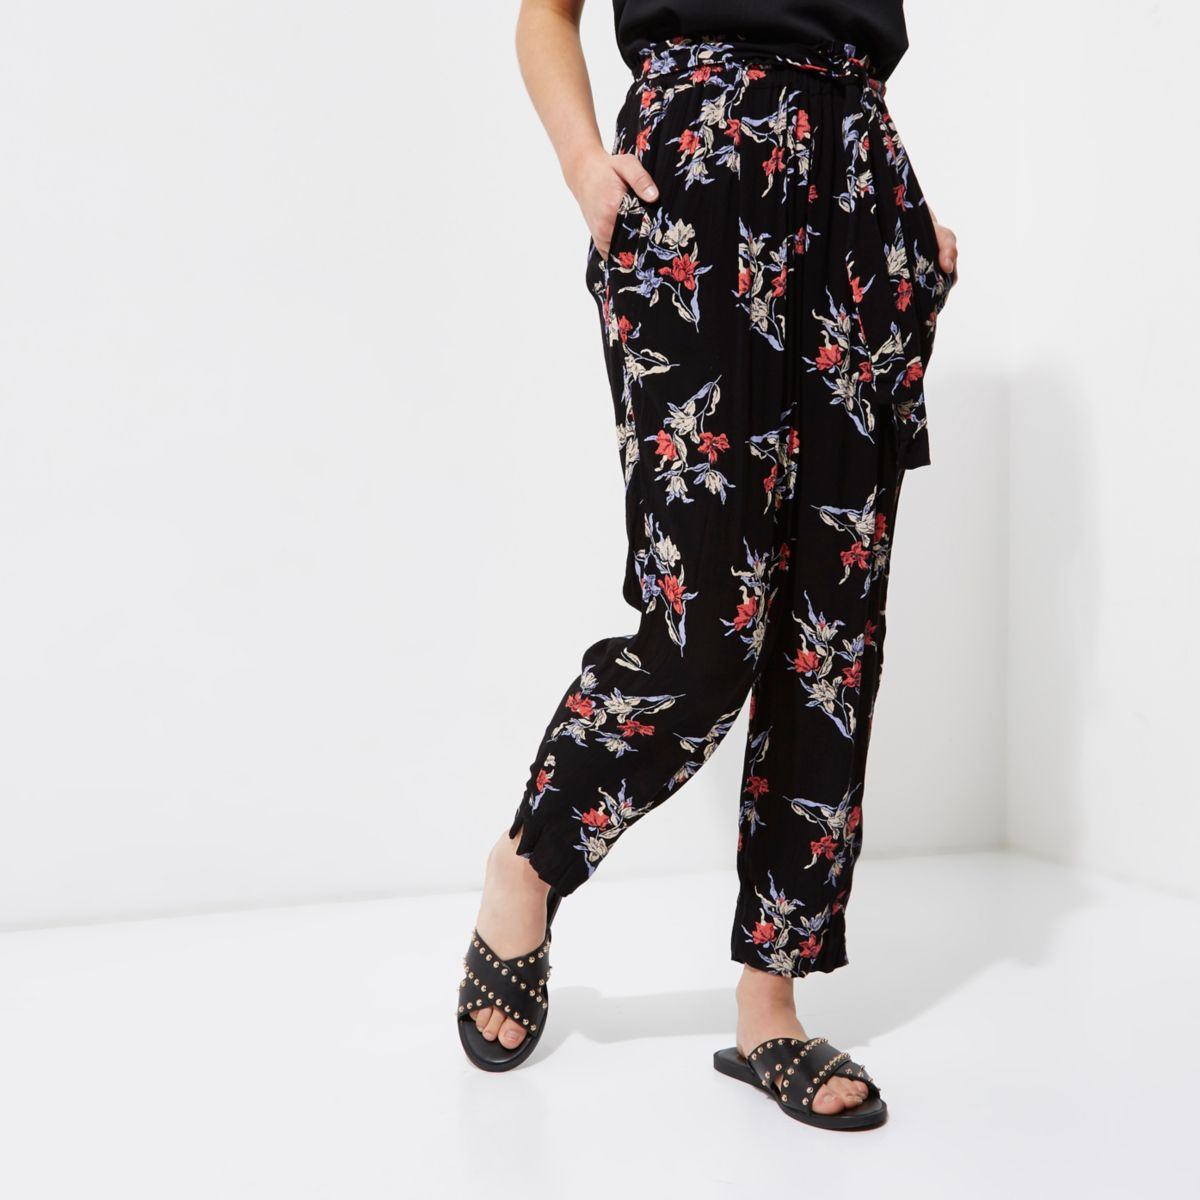 Petite black floral print tapered pants